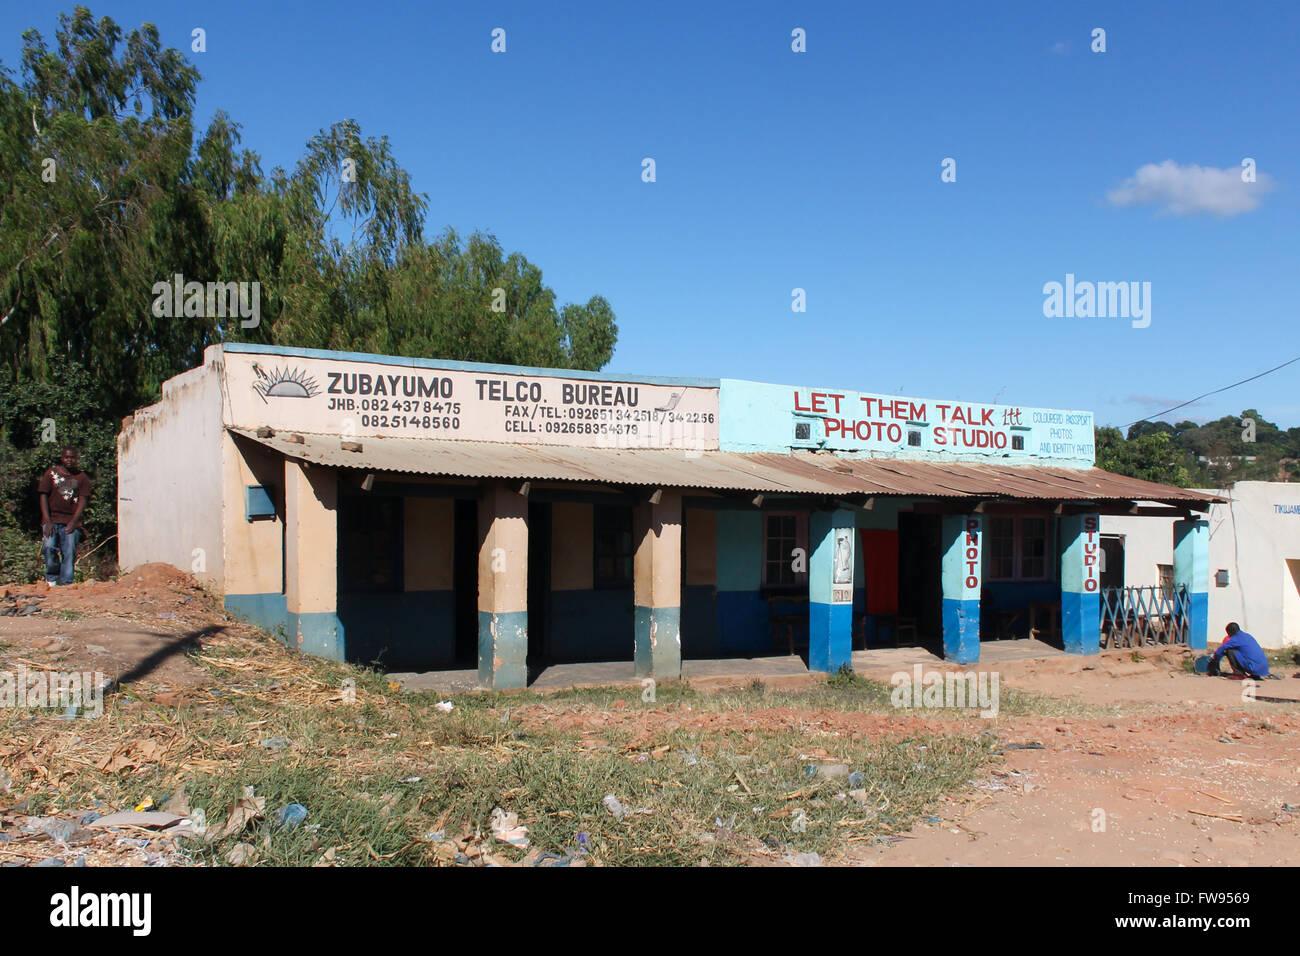 Shops in Mzimba, Malawi. - Stock Image